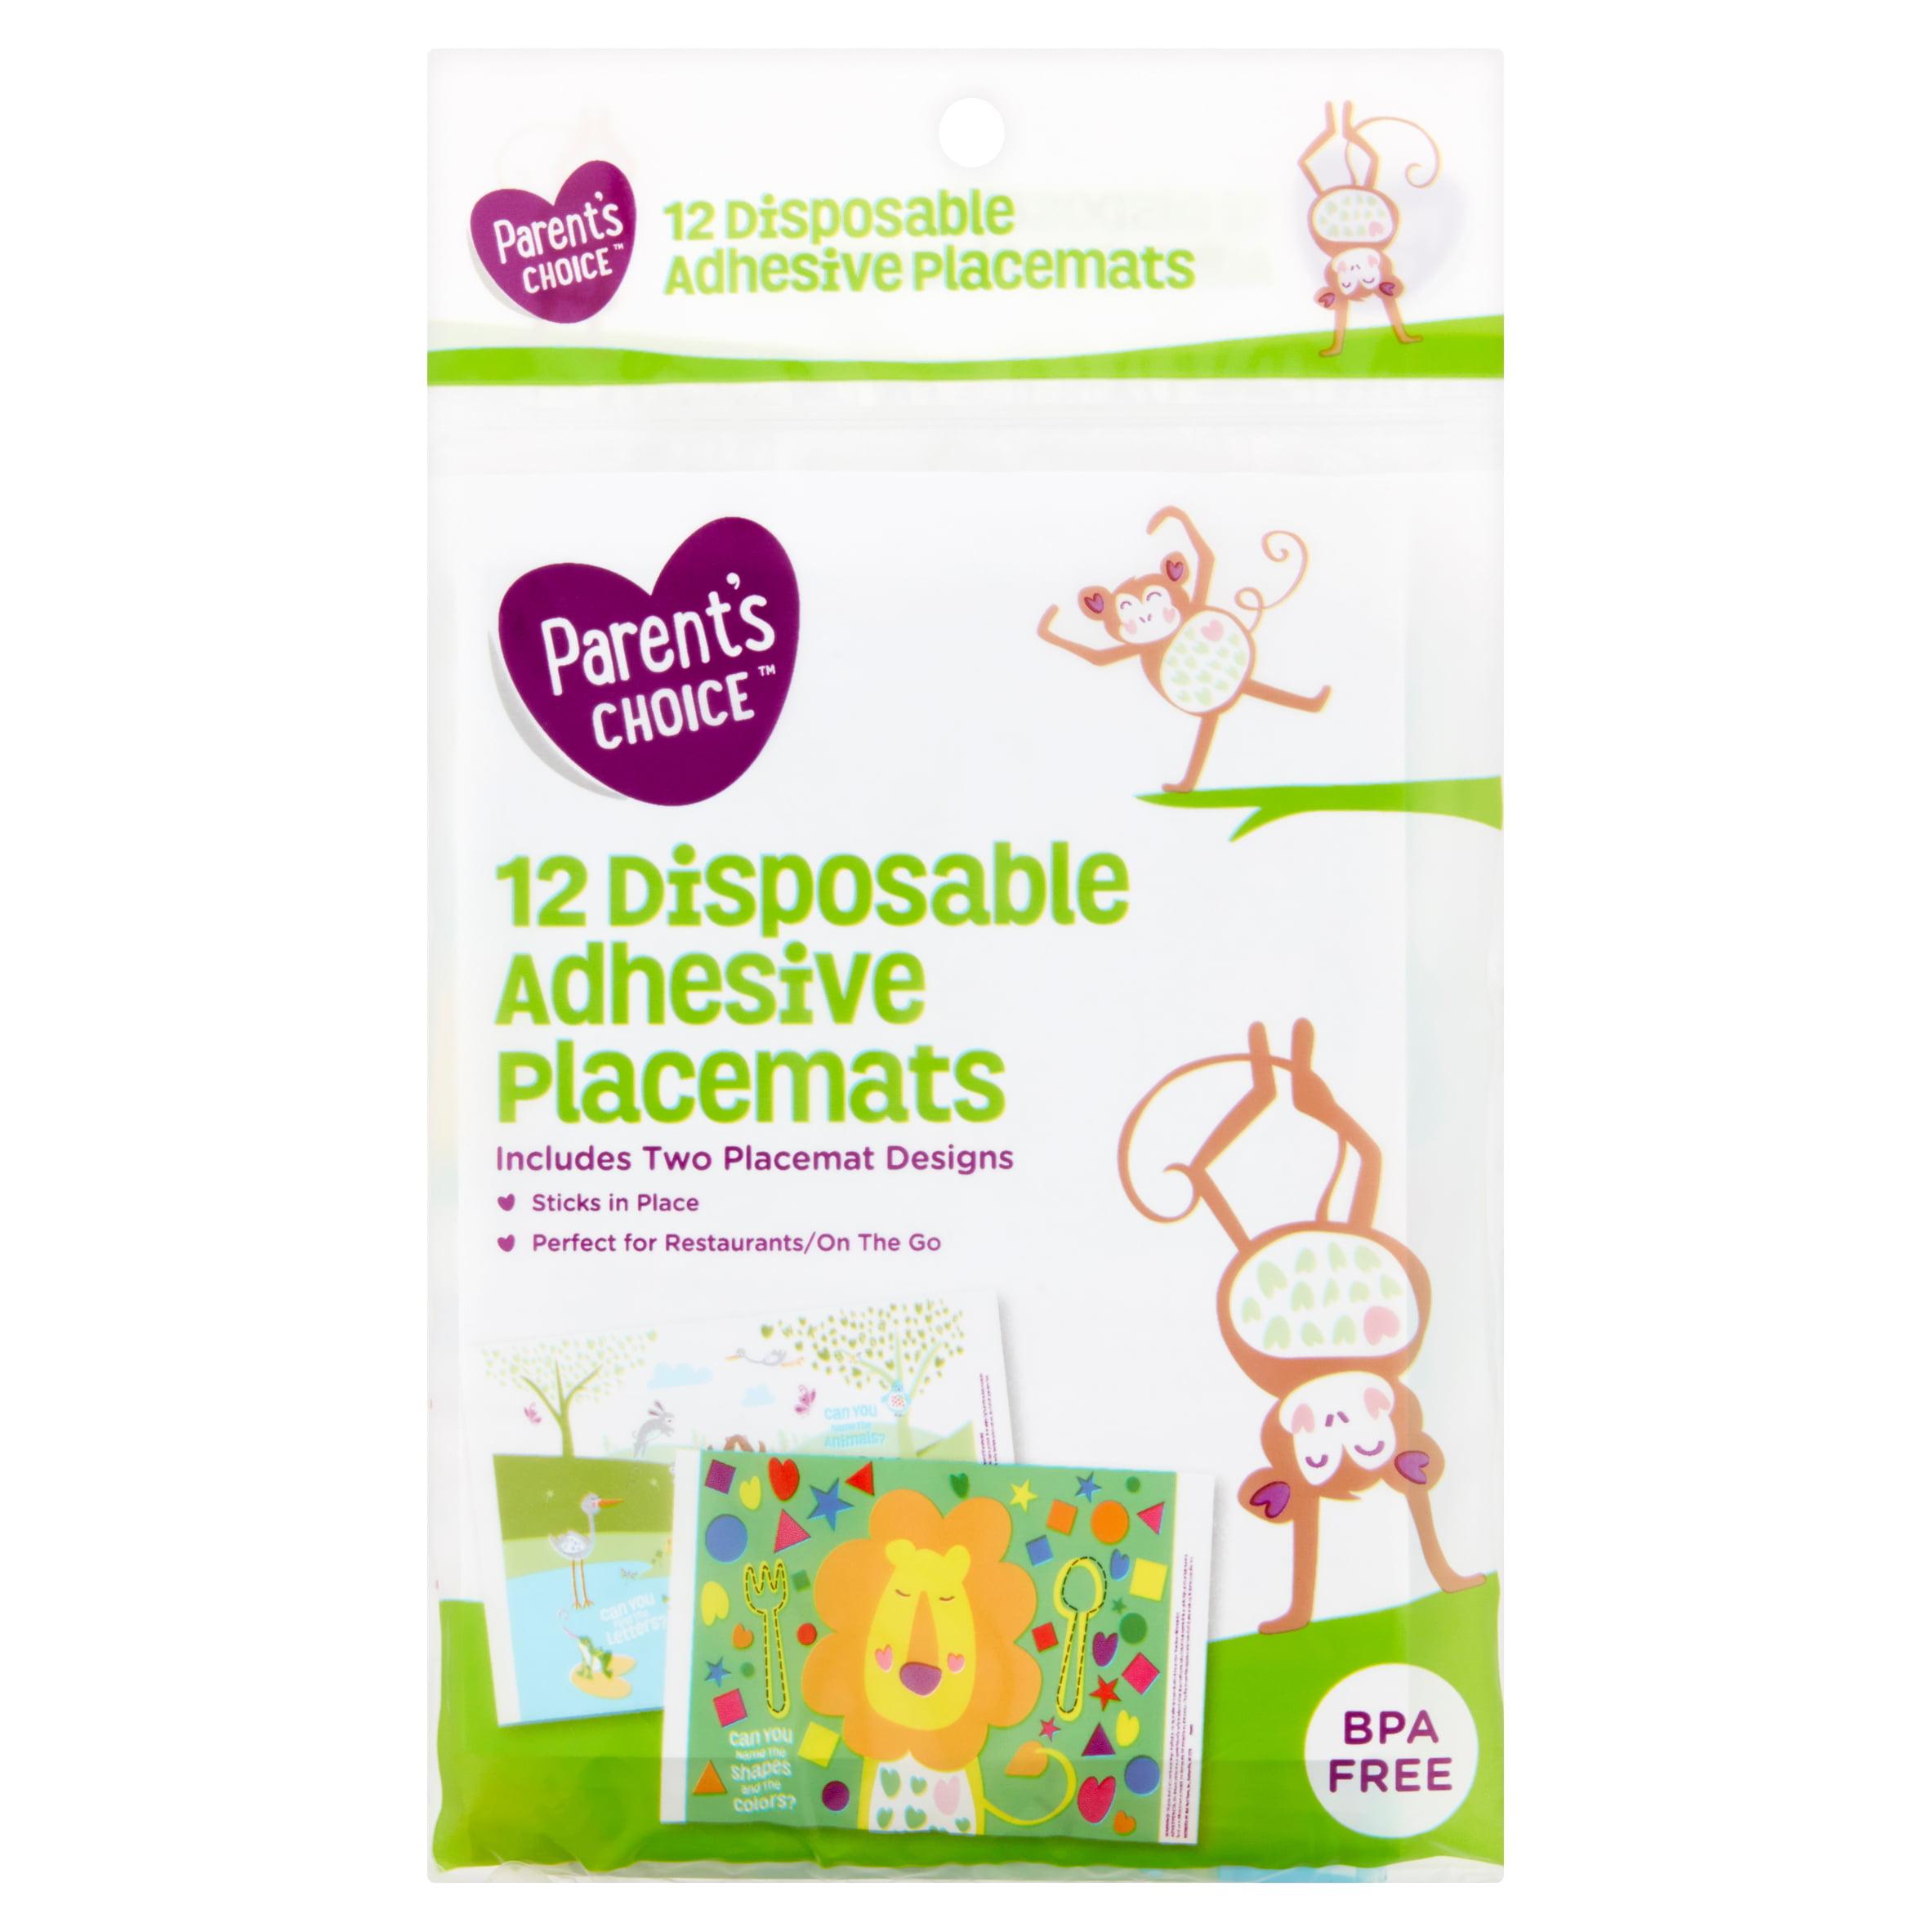 Parent's Choice Disposable Adhesive Placemats, 12 count